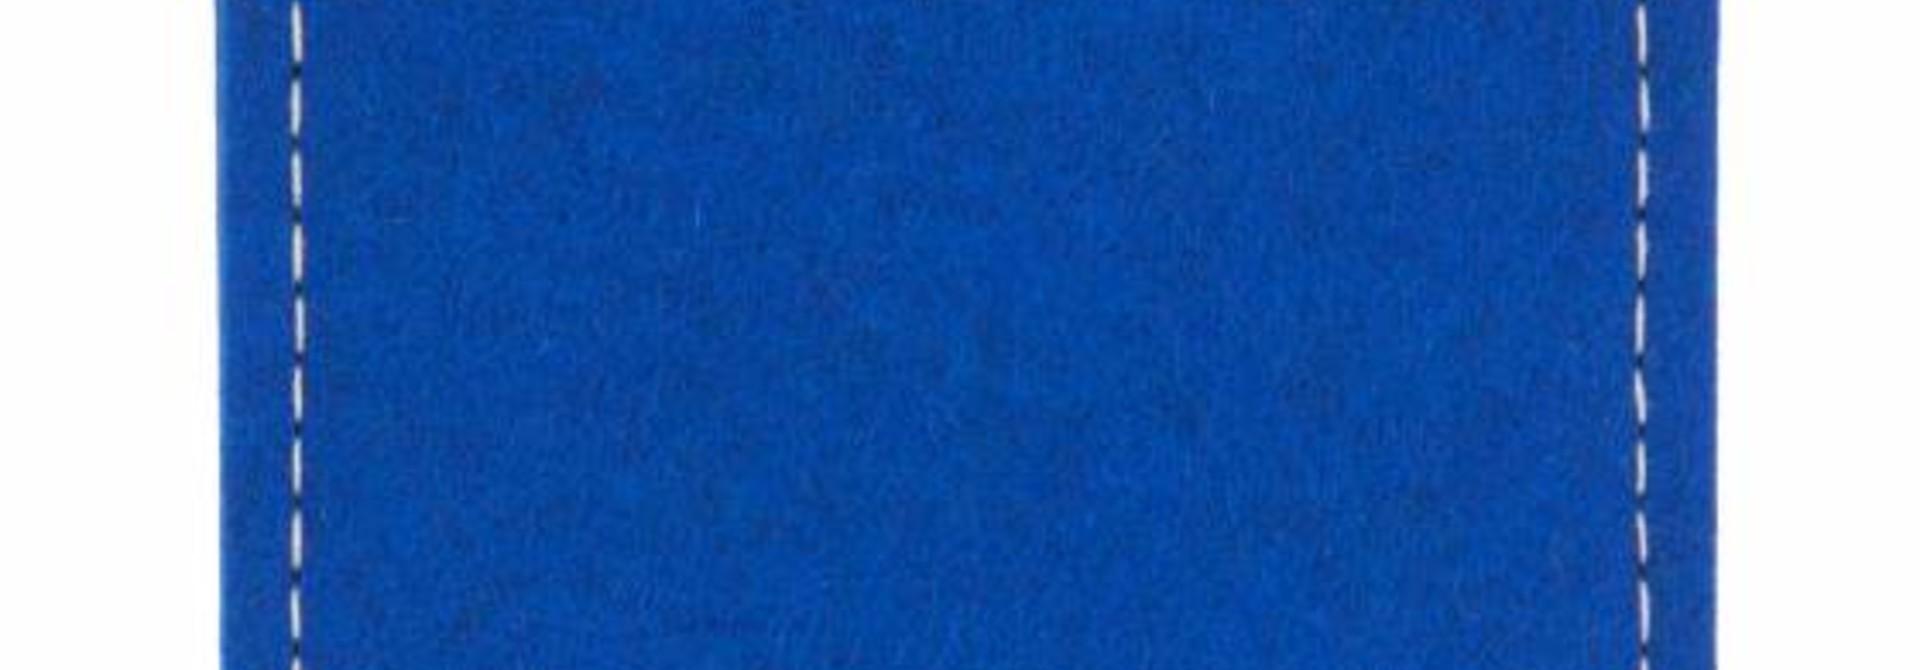 U / Desire / One Sleeve Azure